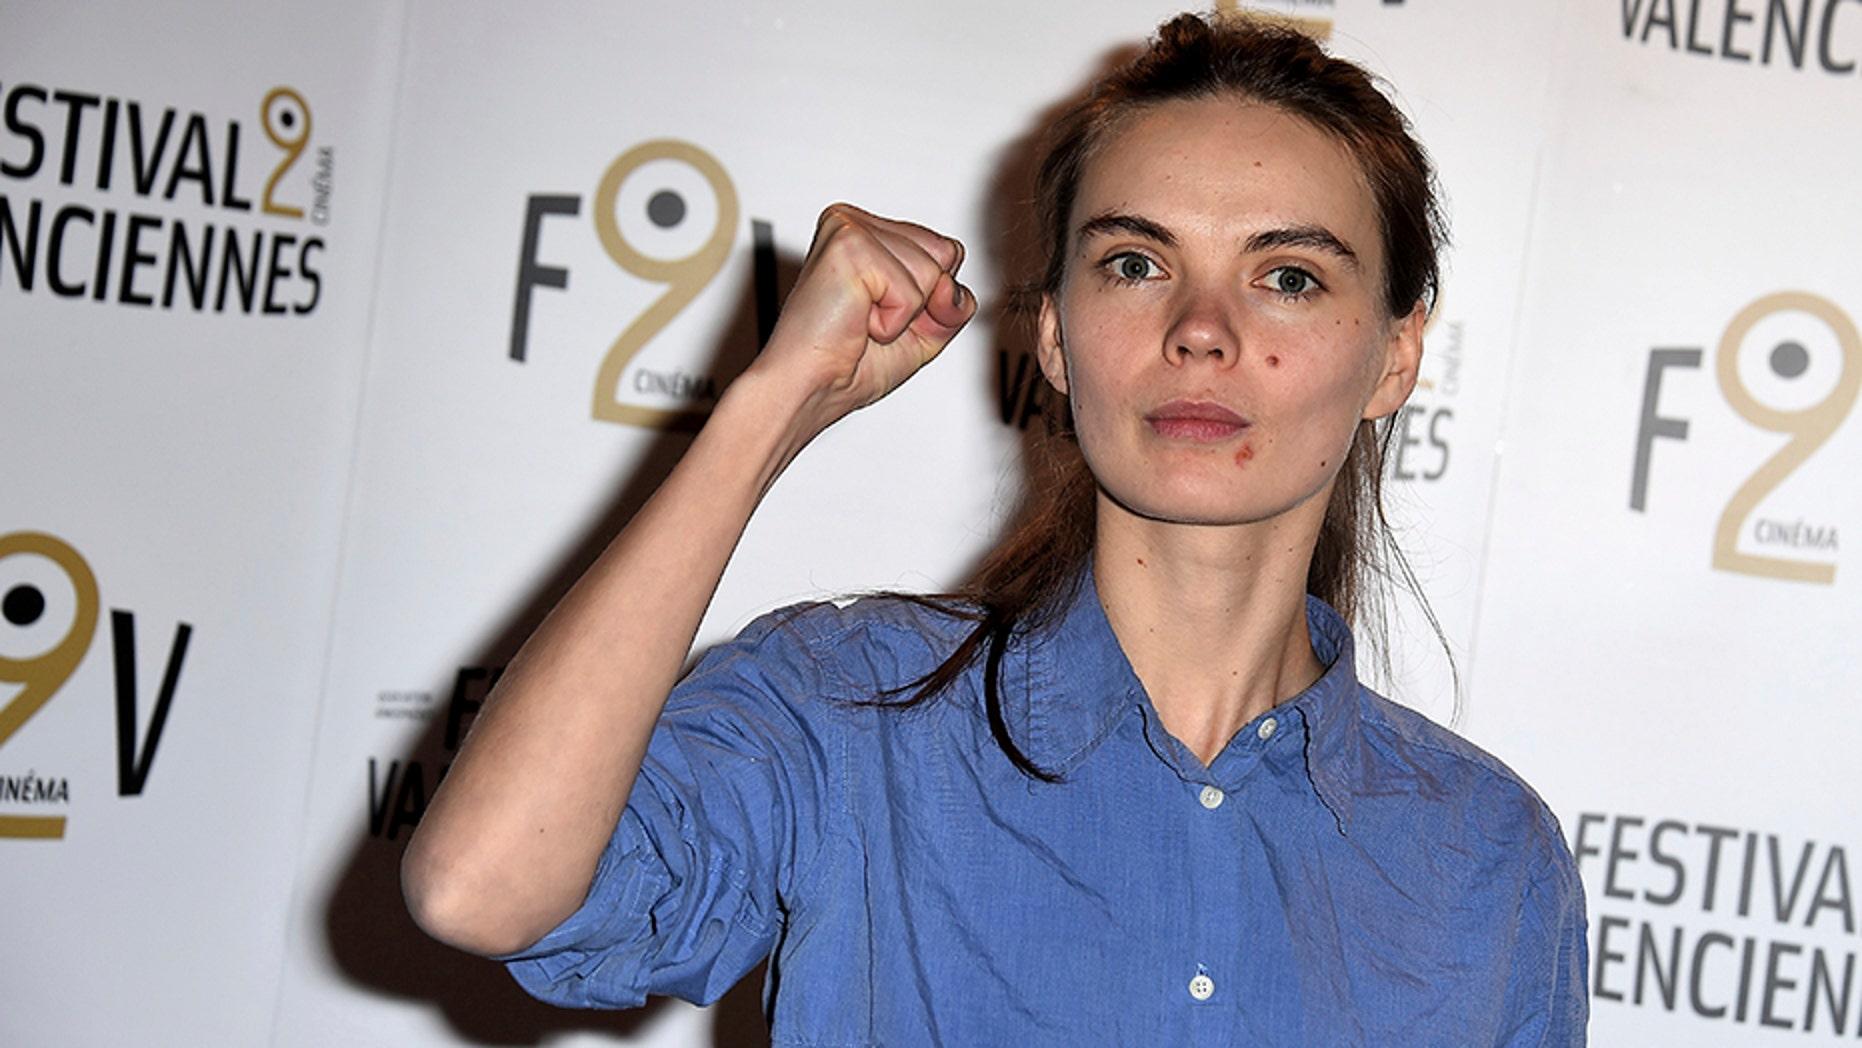 Femen co-founder, Oksana Shachko, was found dead in her Paris apartment.